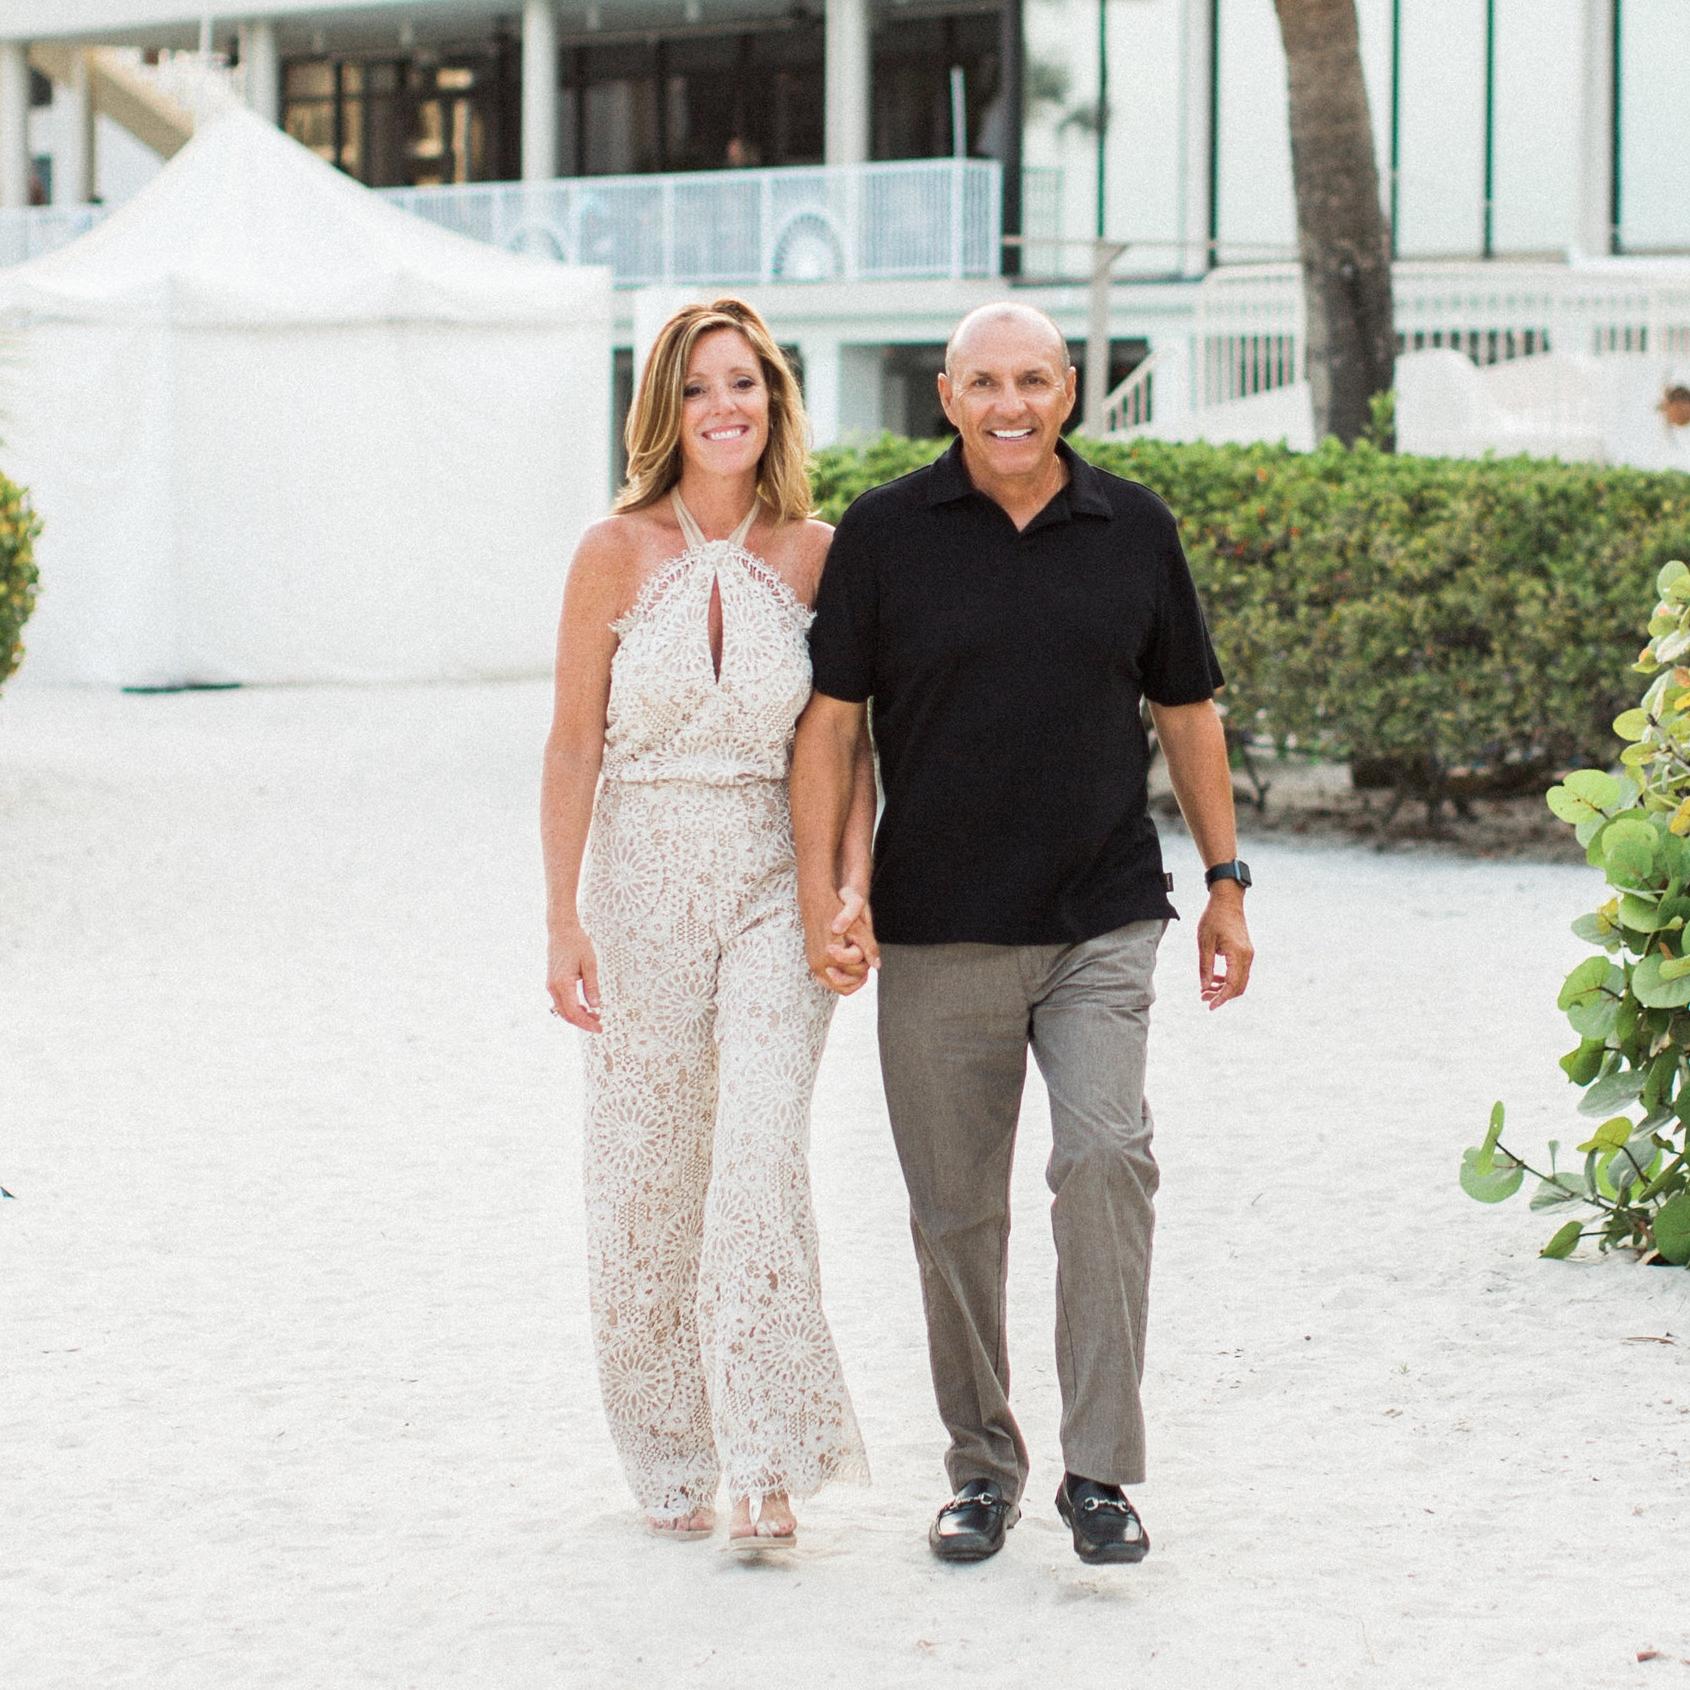 Leslie & Rene Gomez, Gomez Tennis Academy Owners